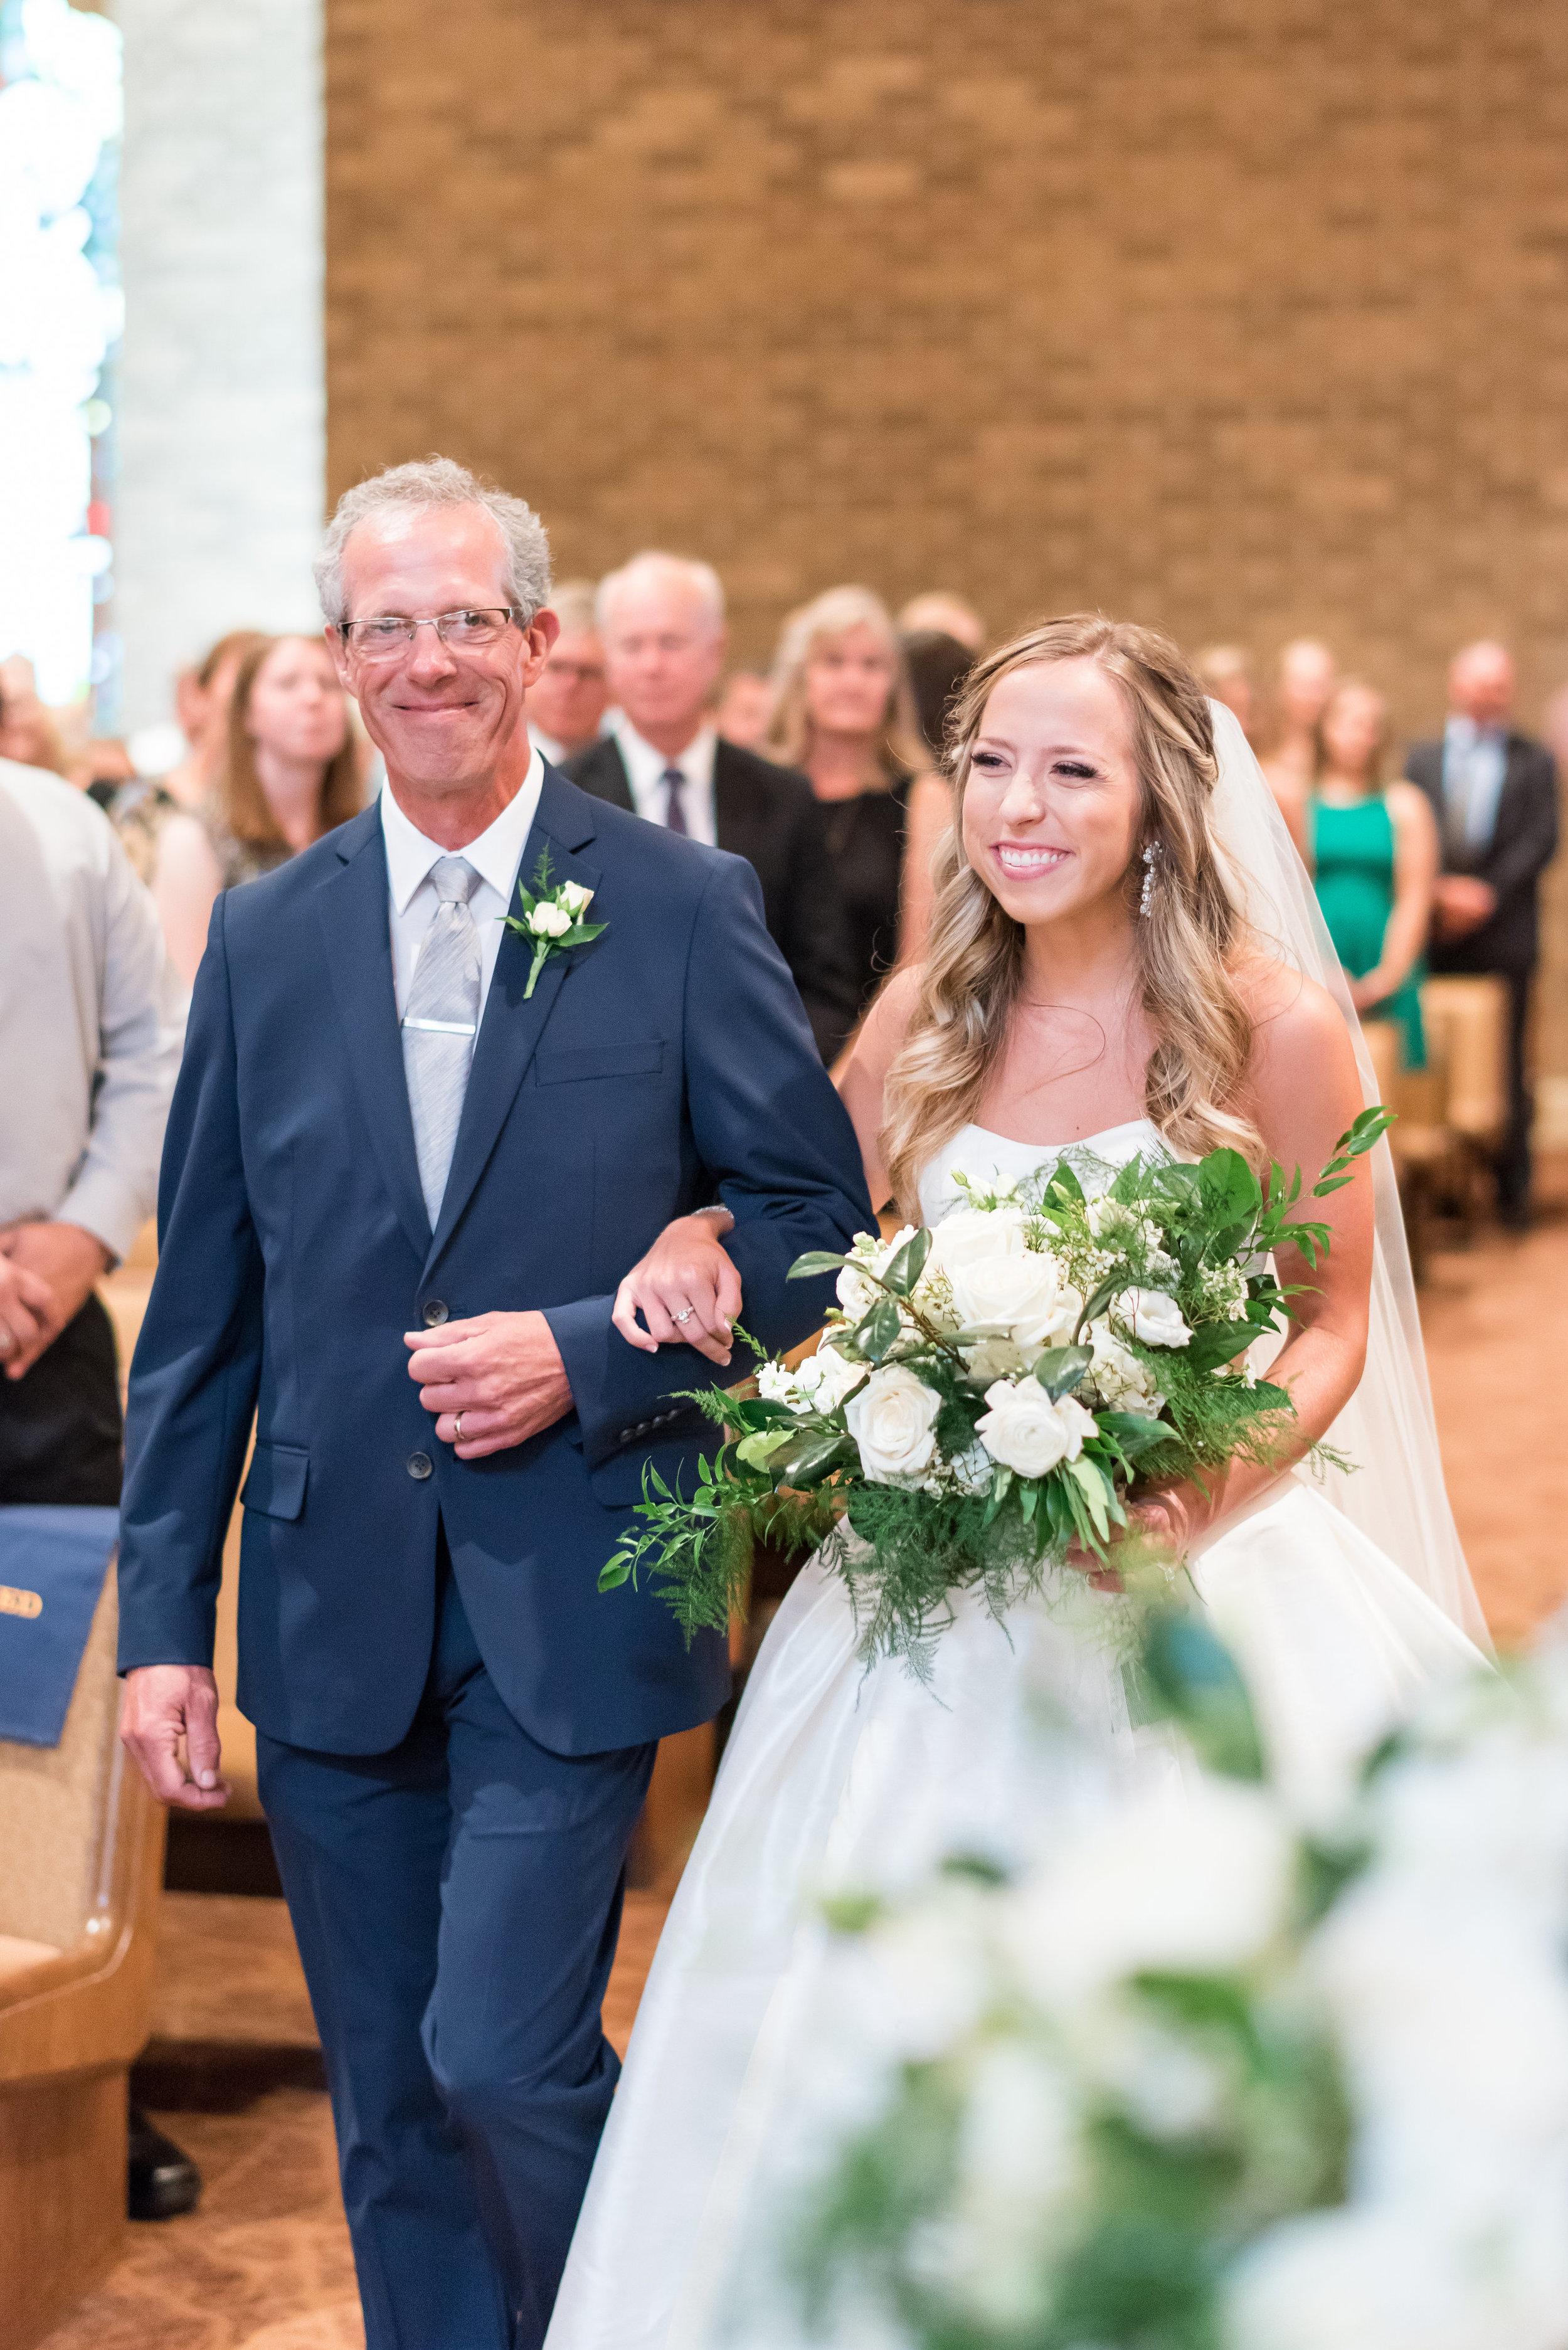 The Dugenske Wedding 9 15 18-0359.jpg